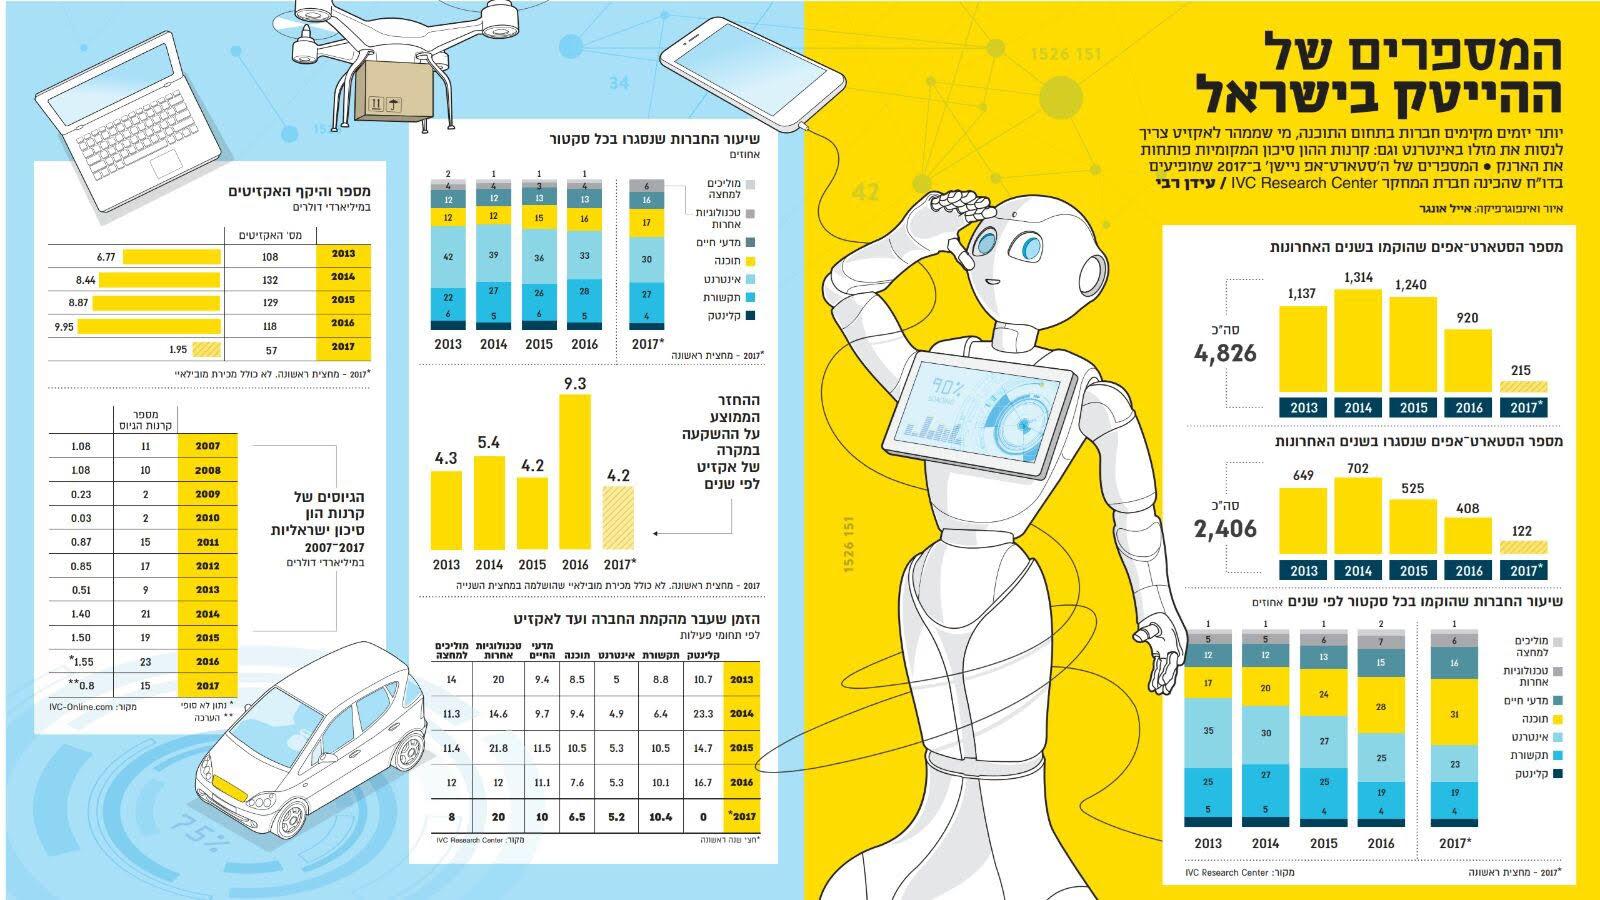 Israeli High Tech in Numbers